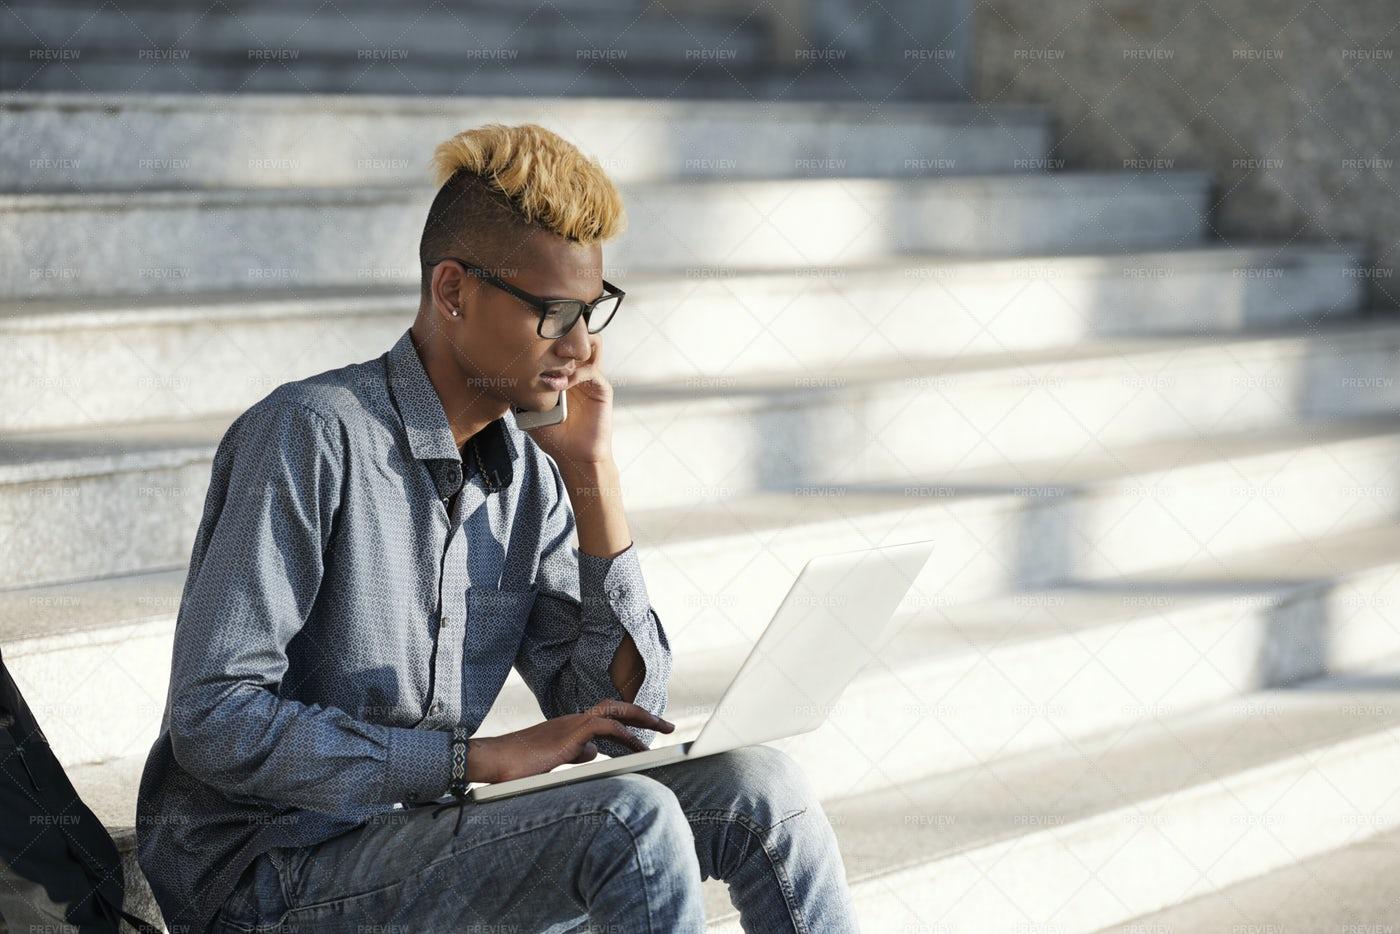 Young Man Working Outdoors: Stock Photos